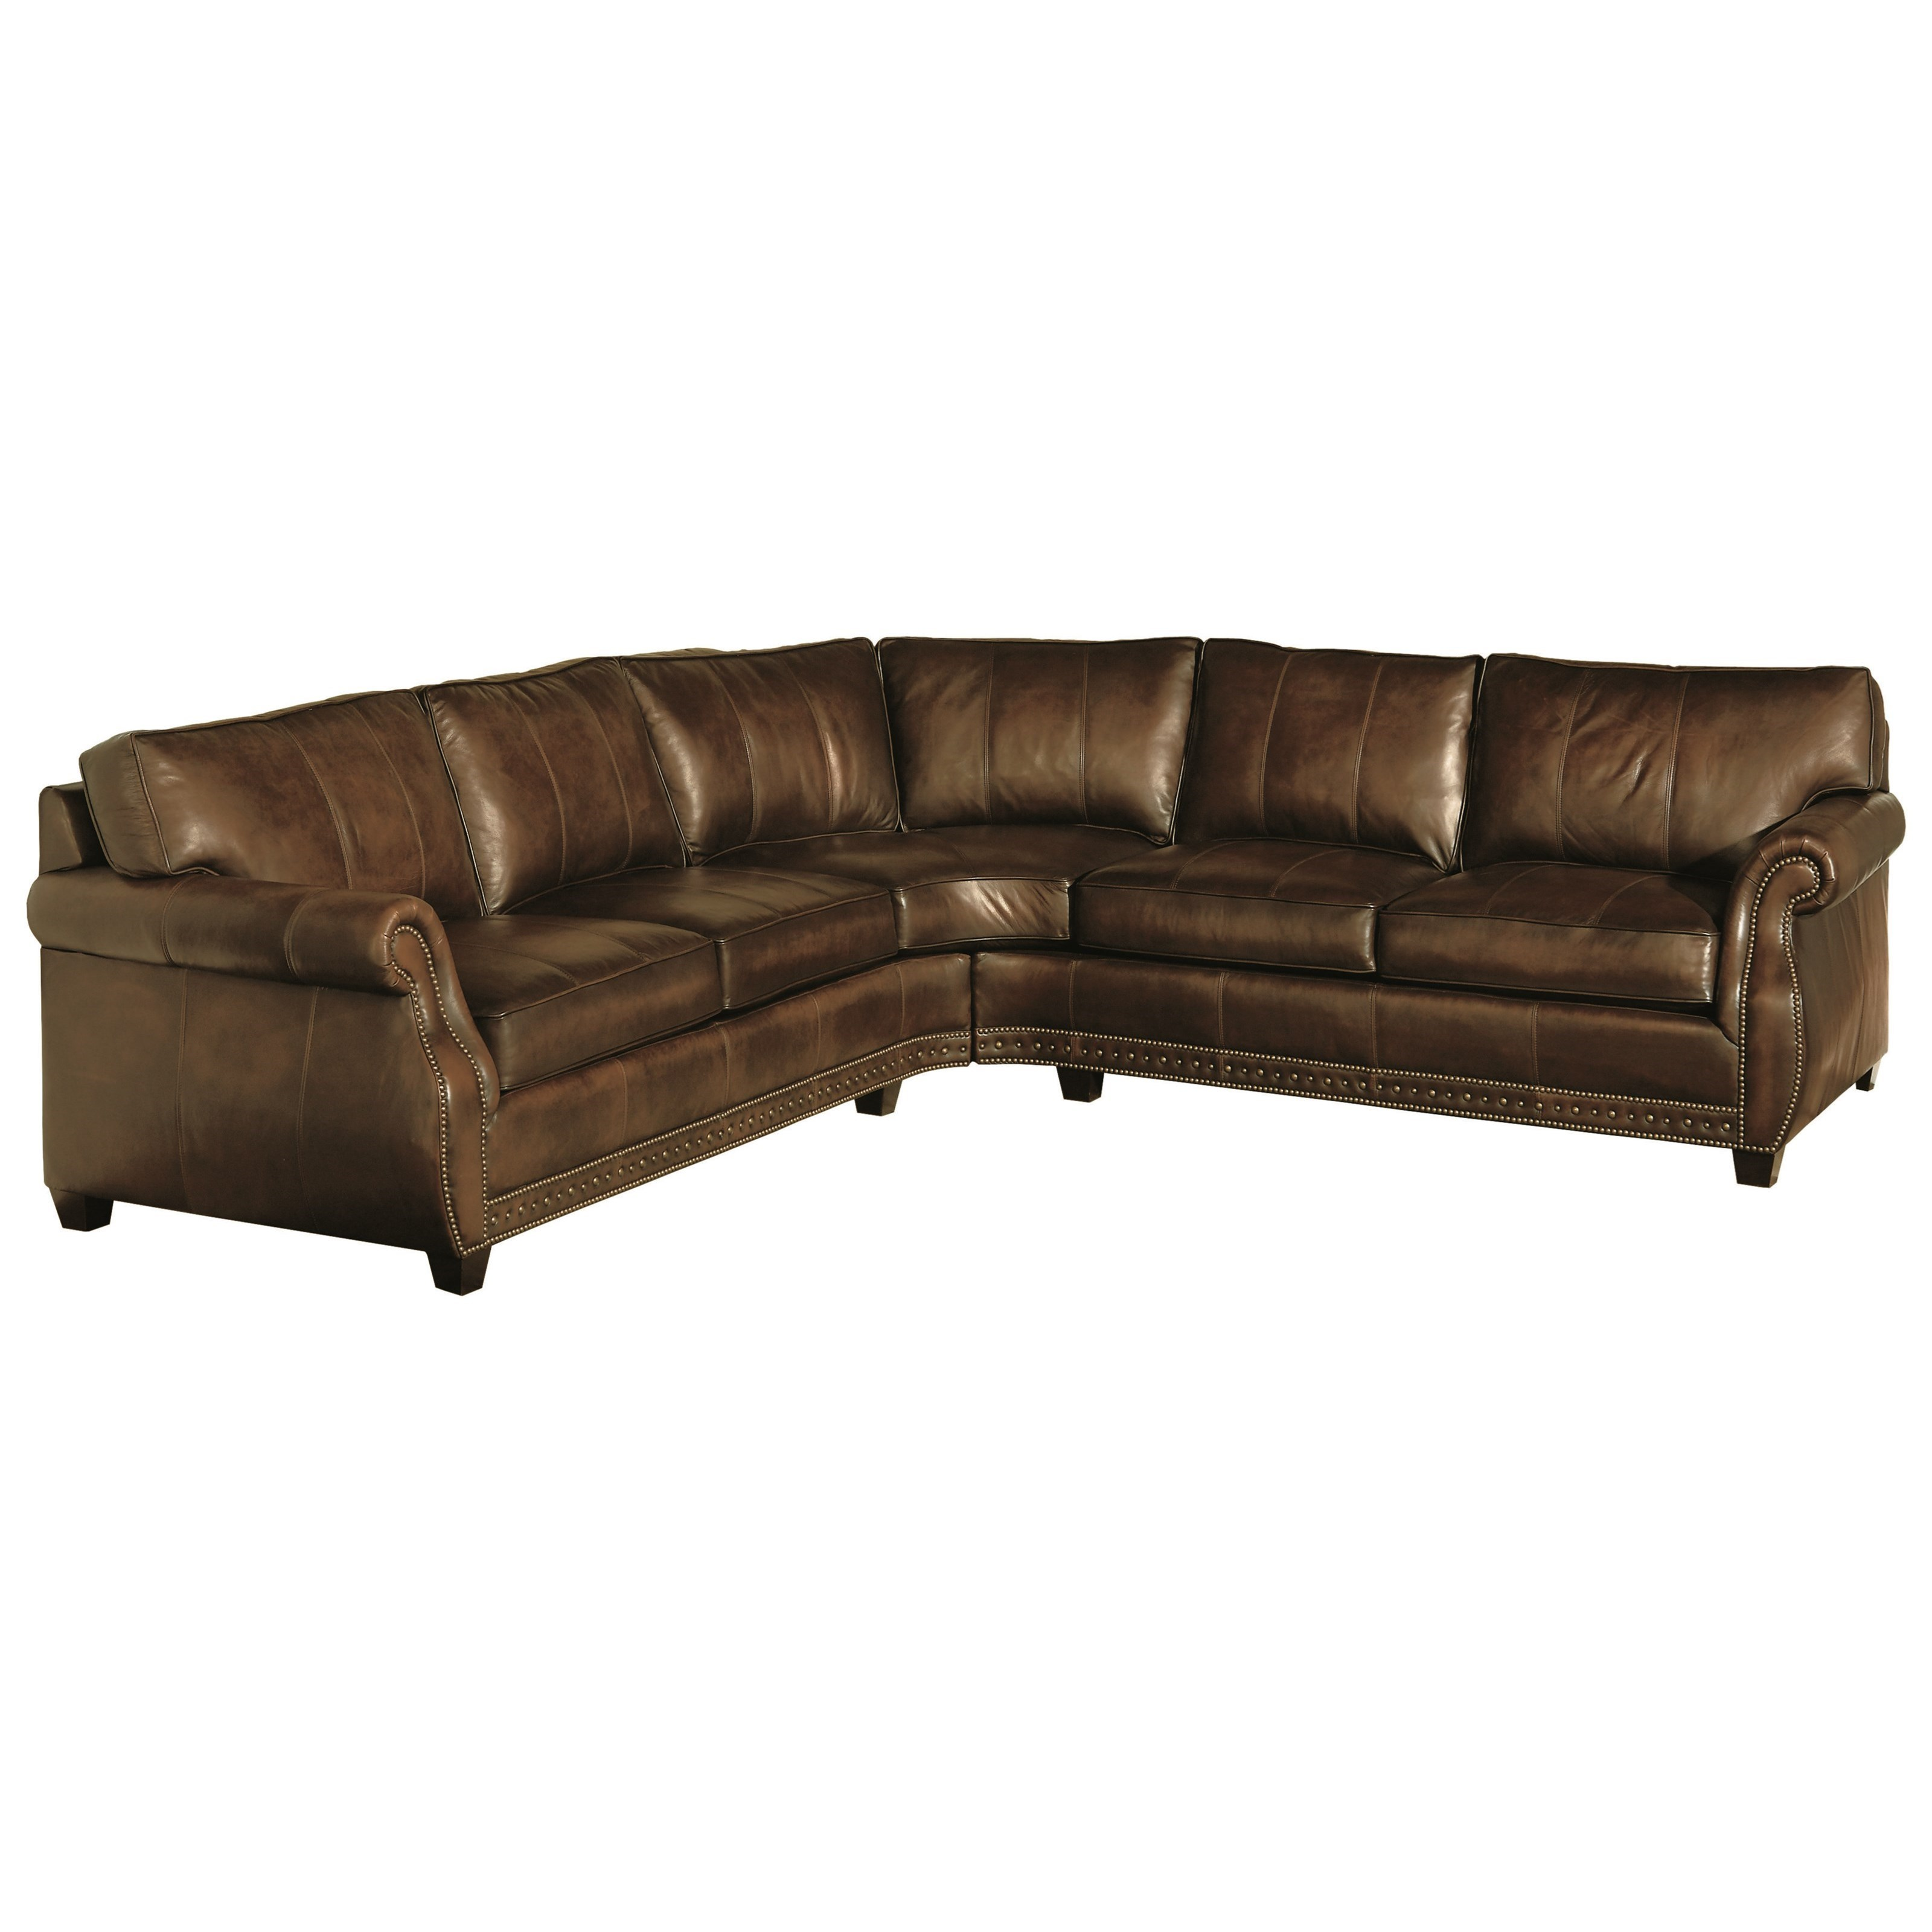 Bernhardt Bradley Leather Sectional